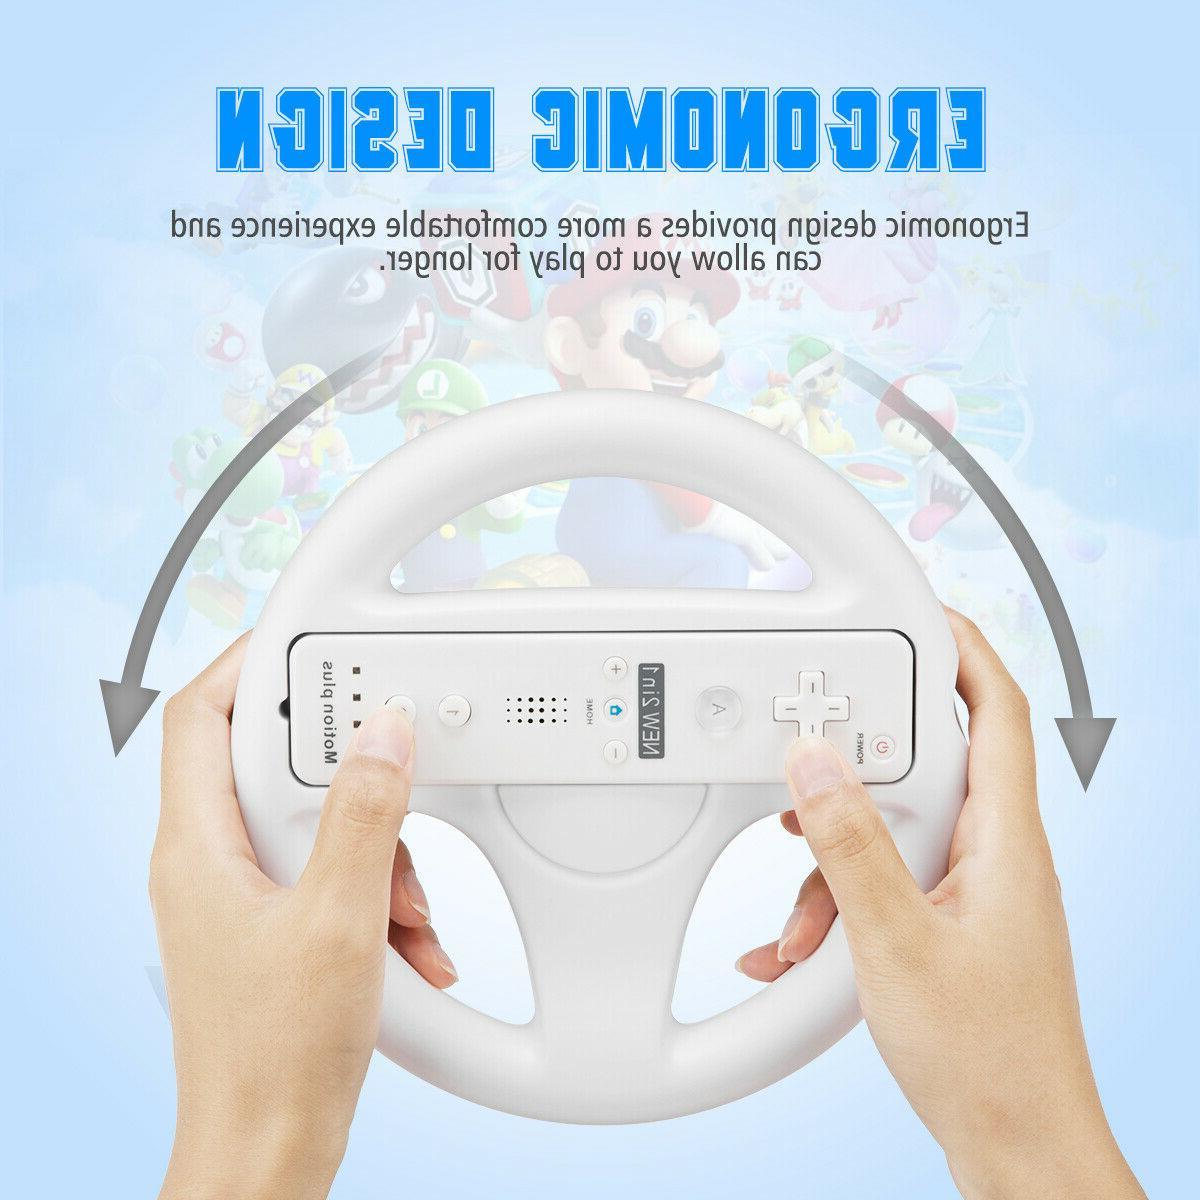 2Pc Wheel Wii Mario